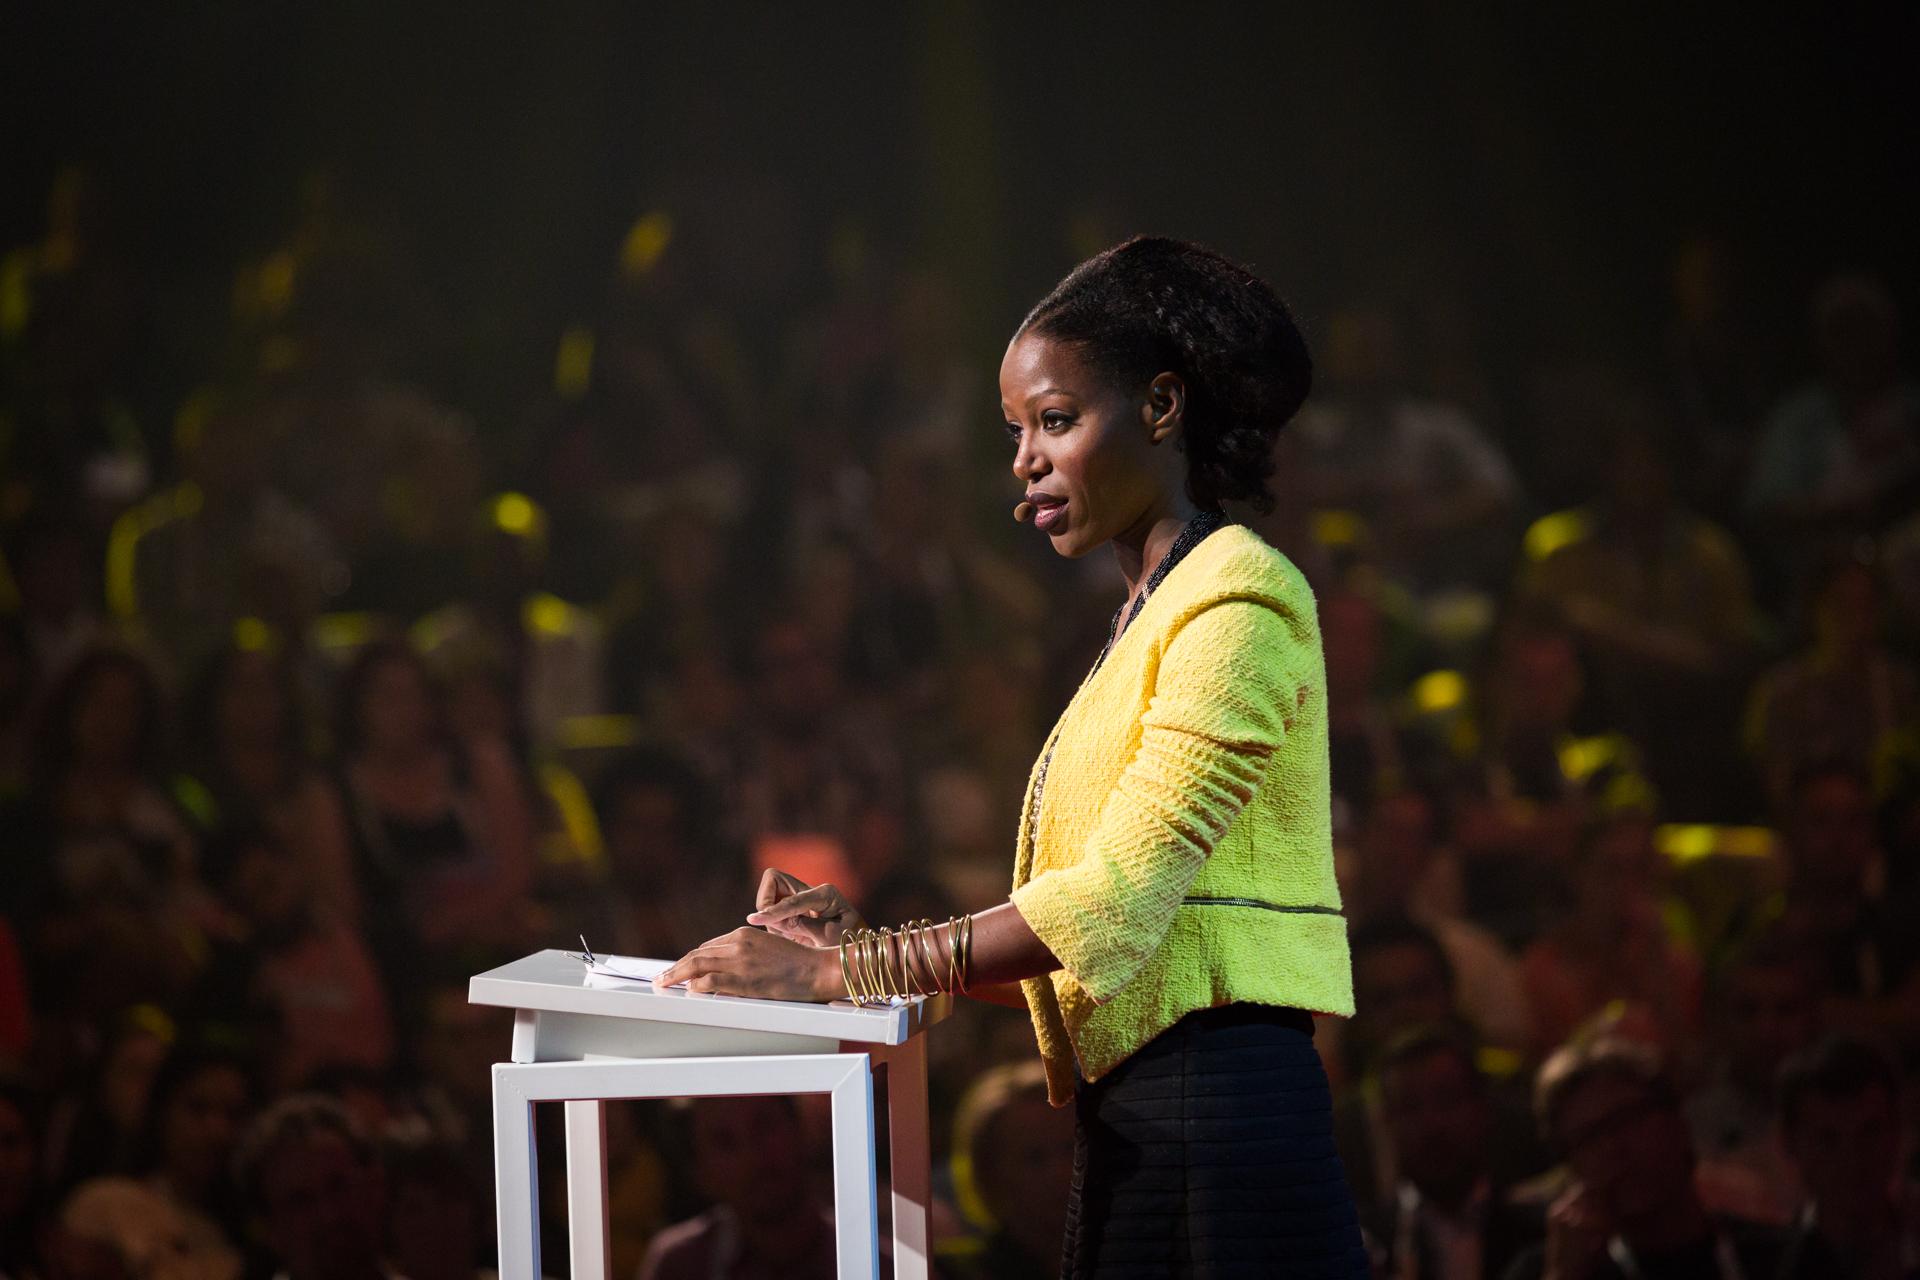 Taiye Selasi speaking at TEDGlobal 2014.